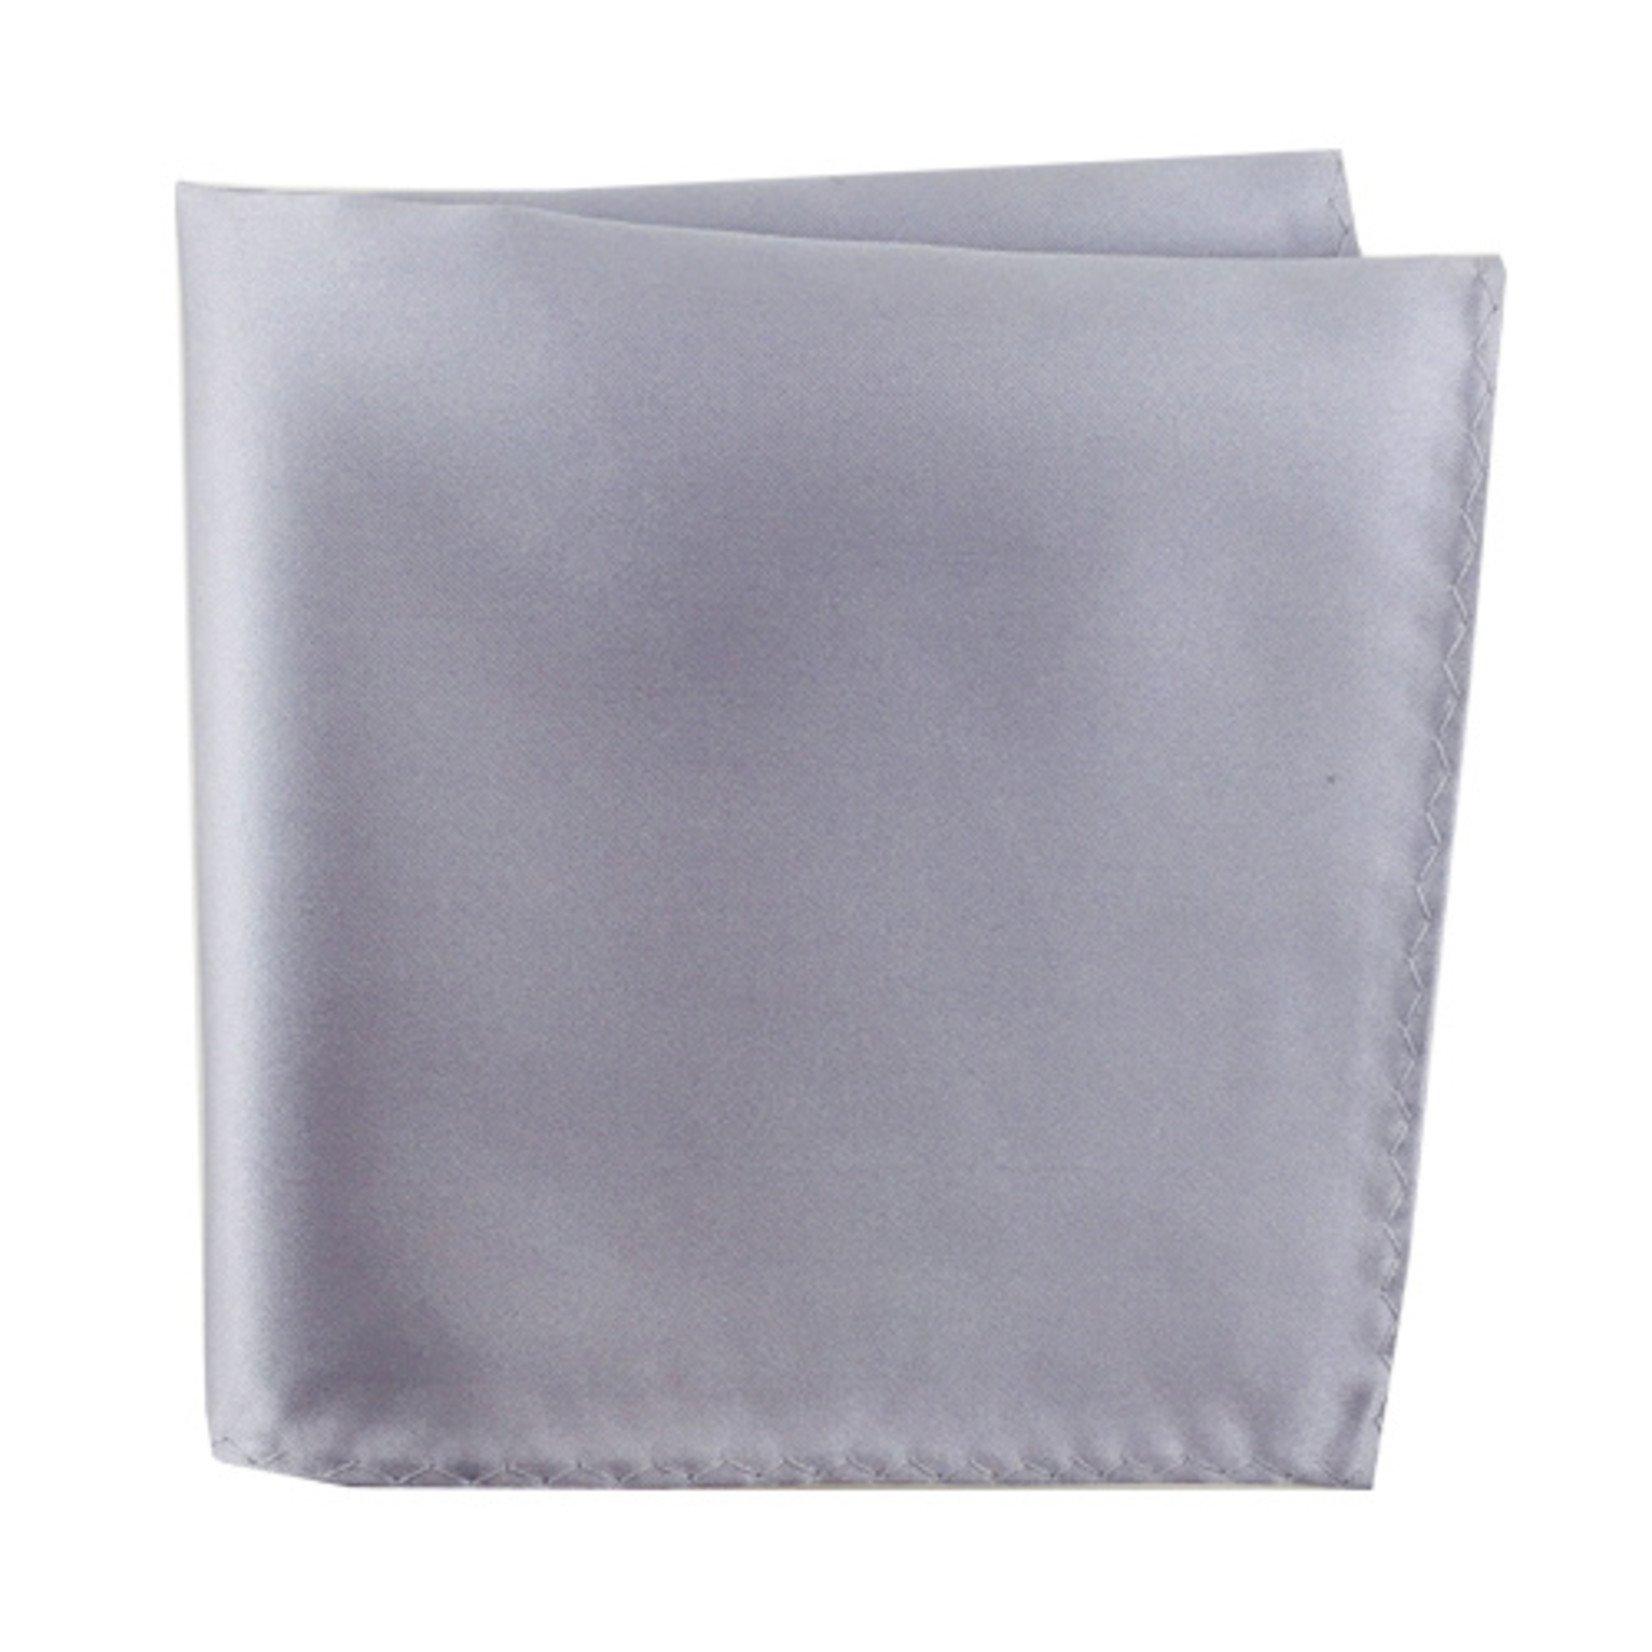 Knotz M100PSQ-17 Solid Silver Pocket Square